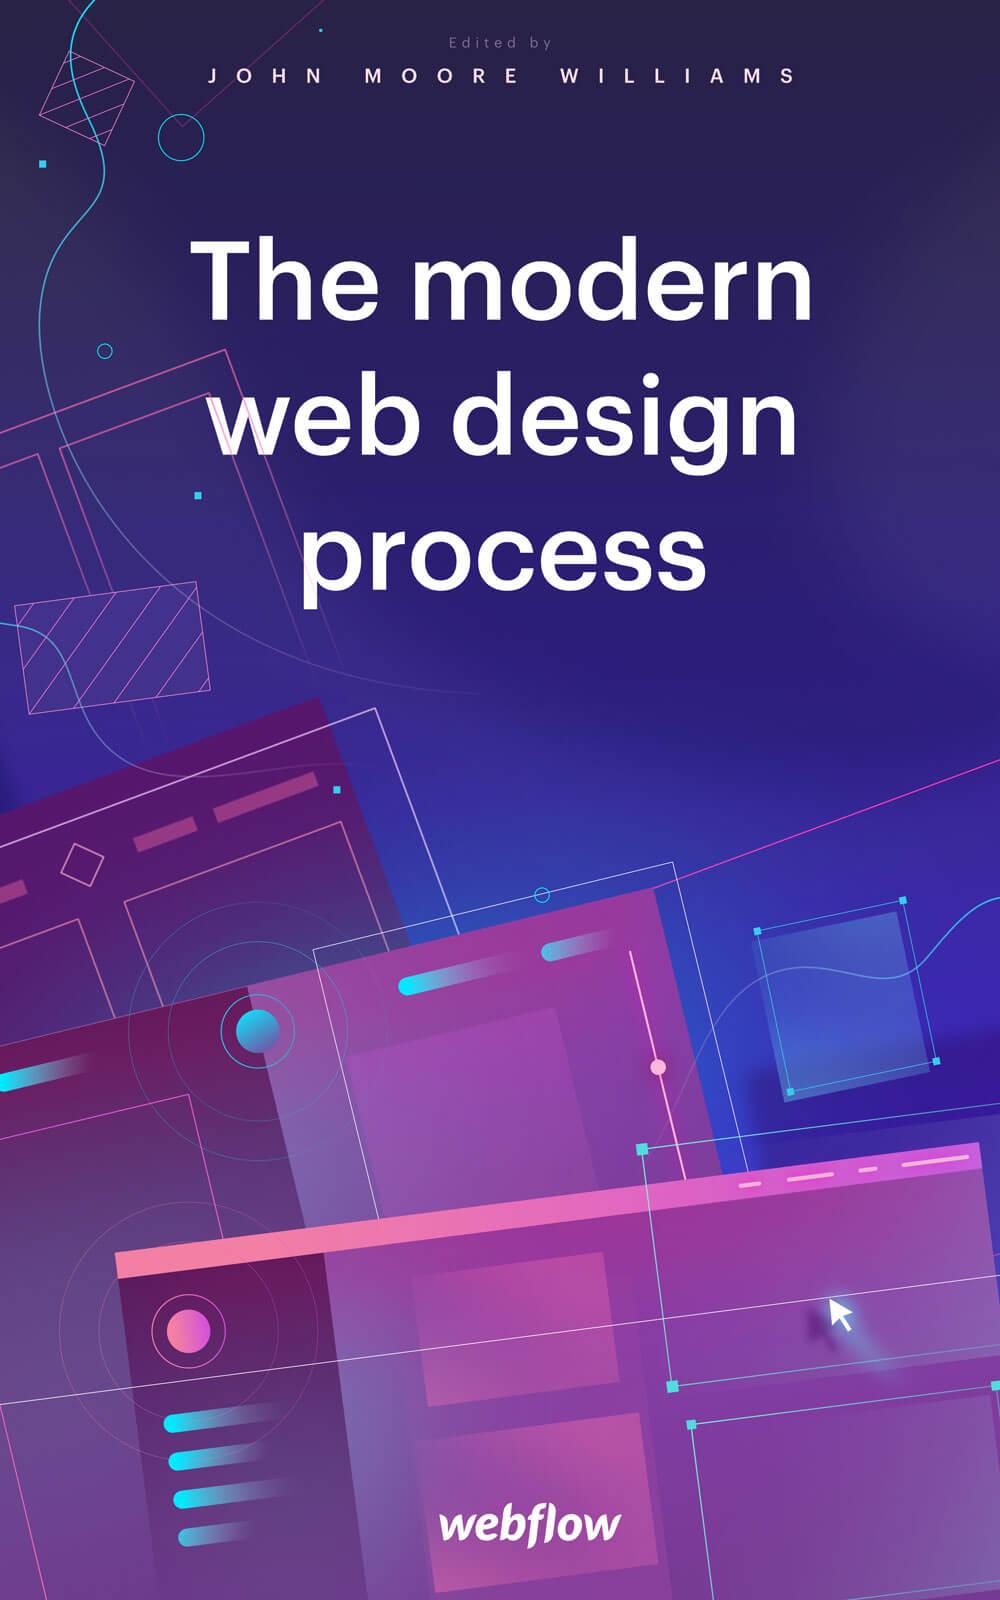 Link to The Modern Web Design Process Ebook